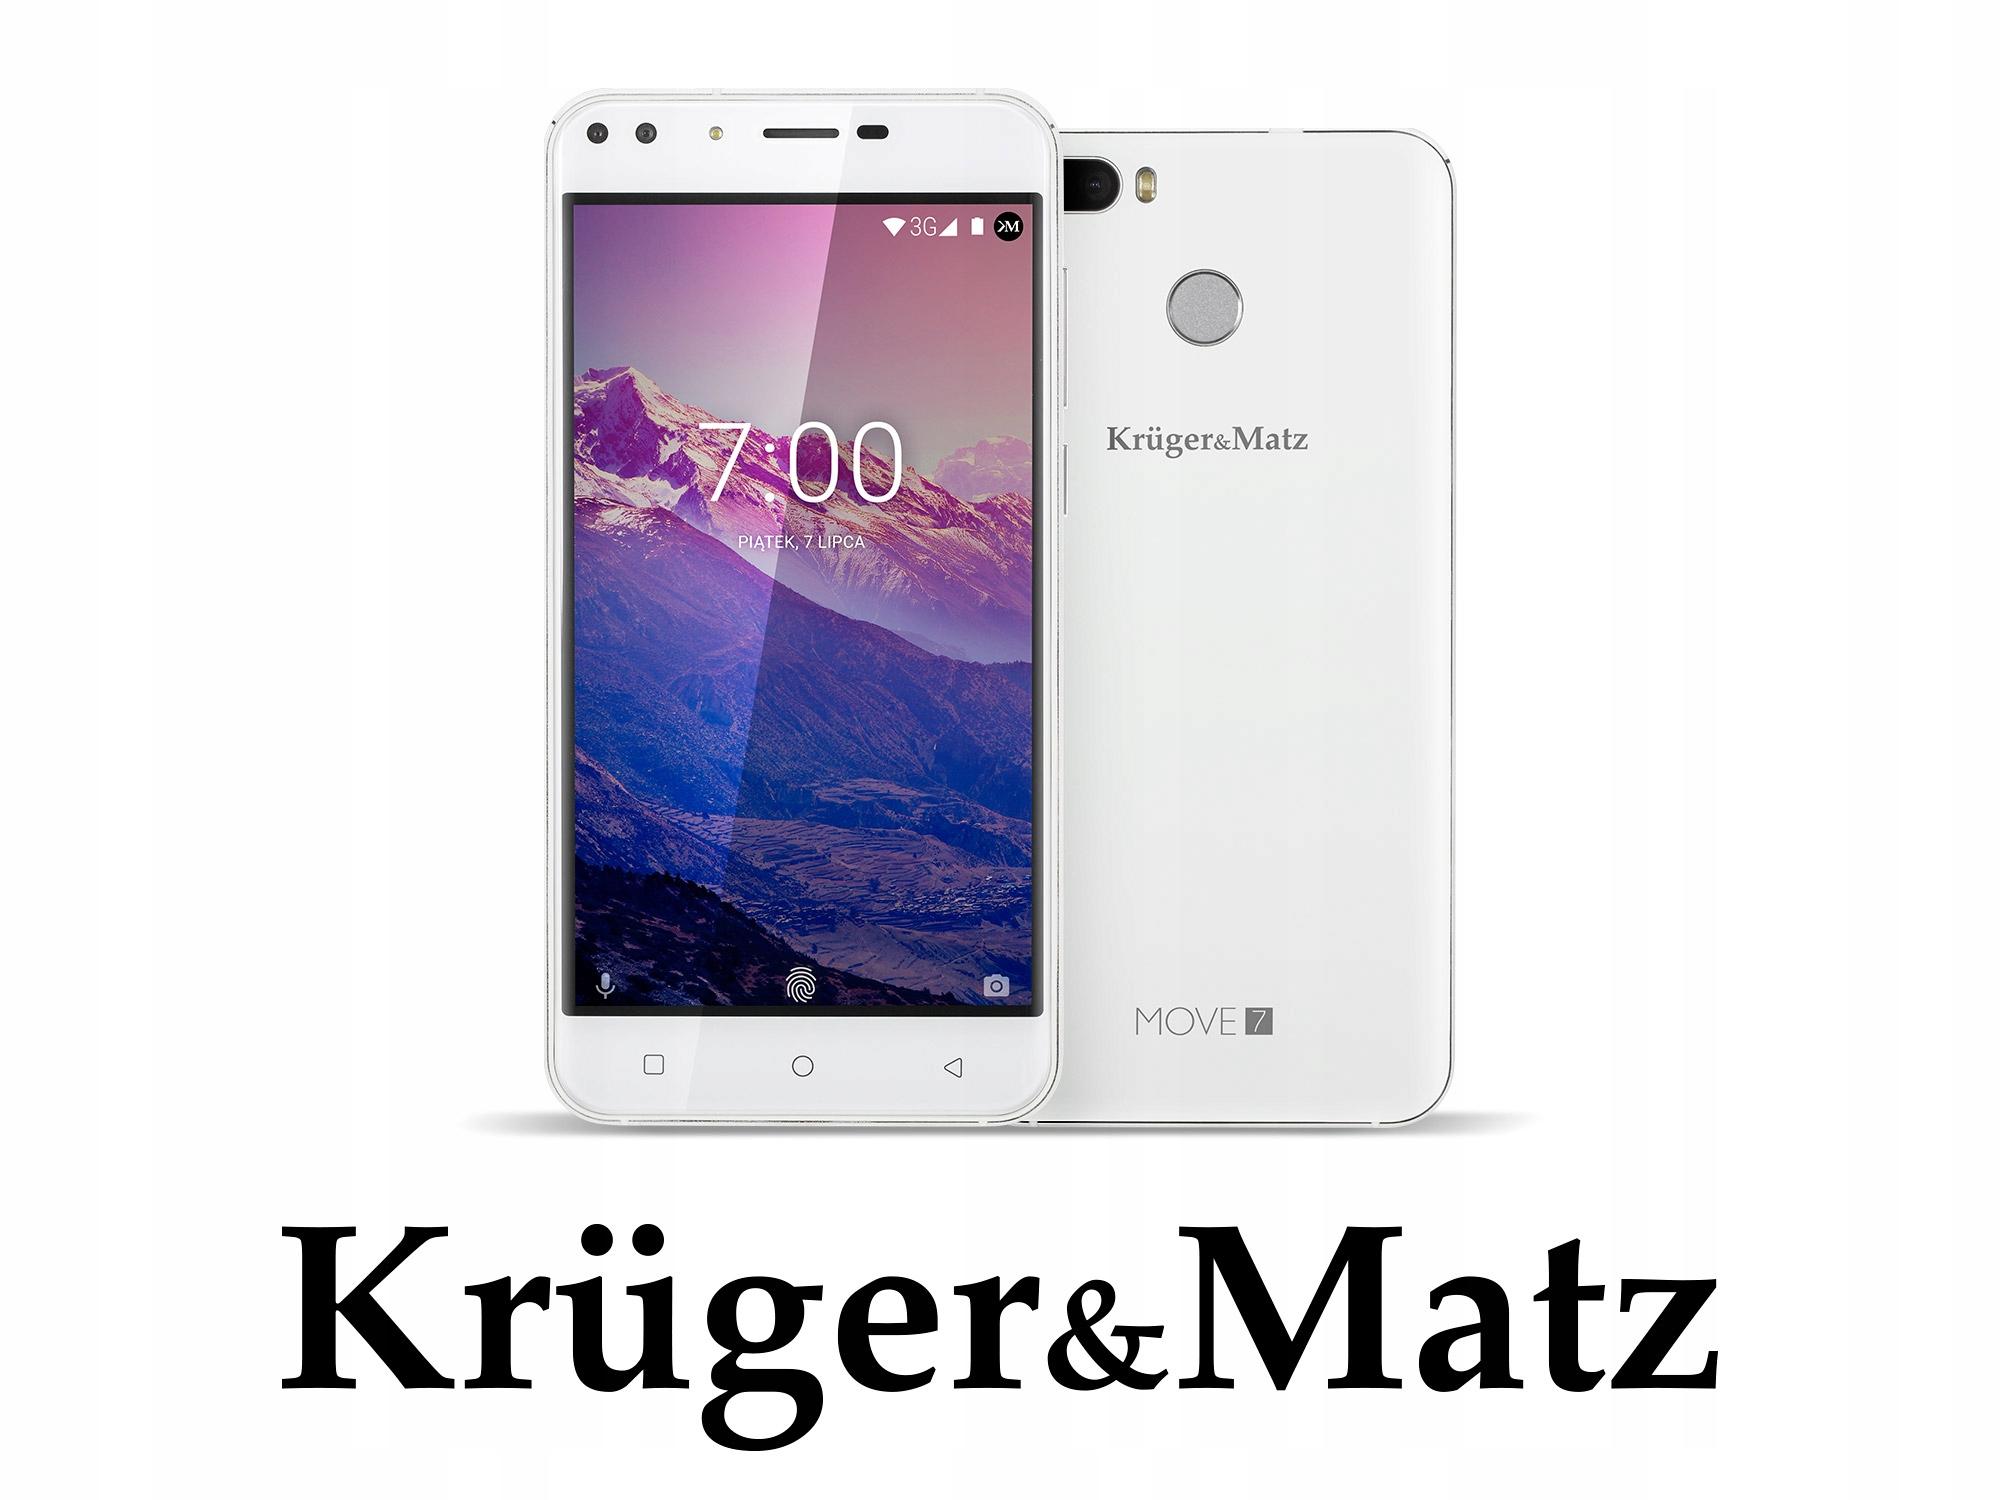 Smartfon Kruger&Matz MOVE 7 Dual Camera KOLORY